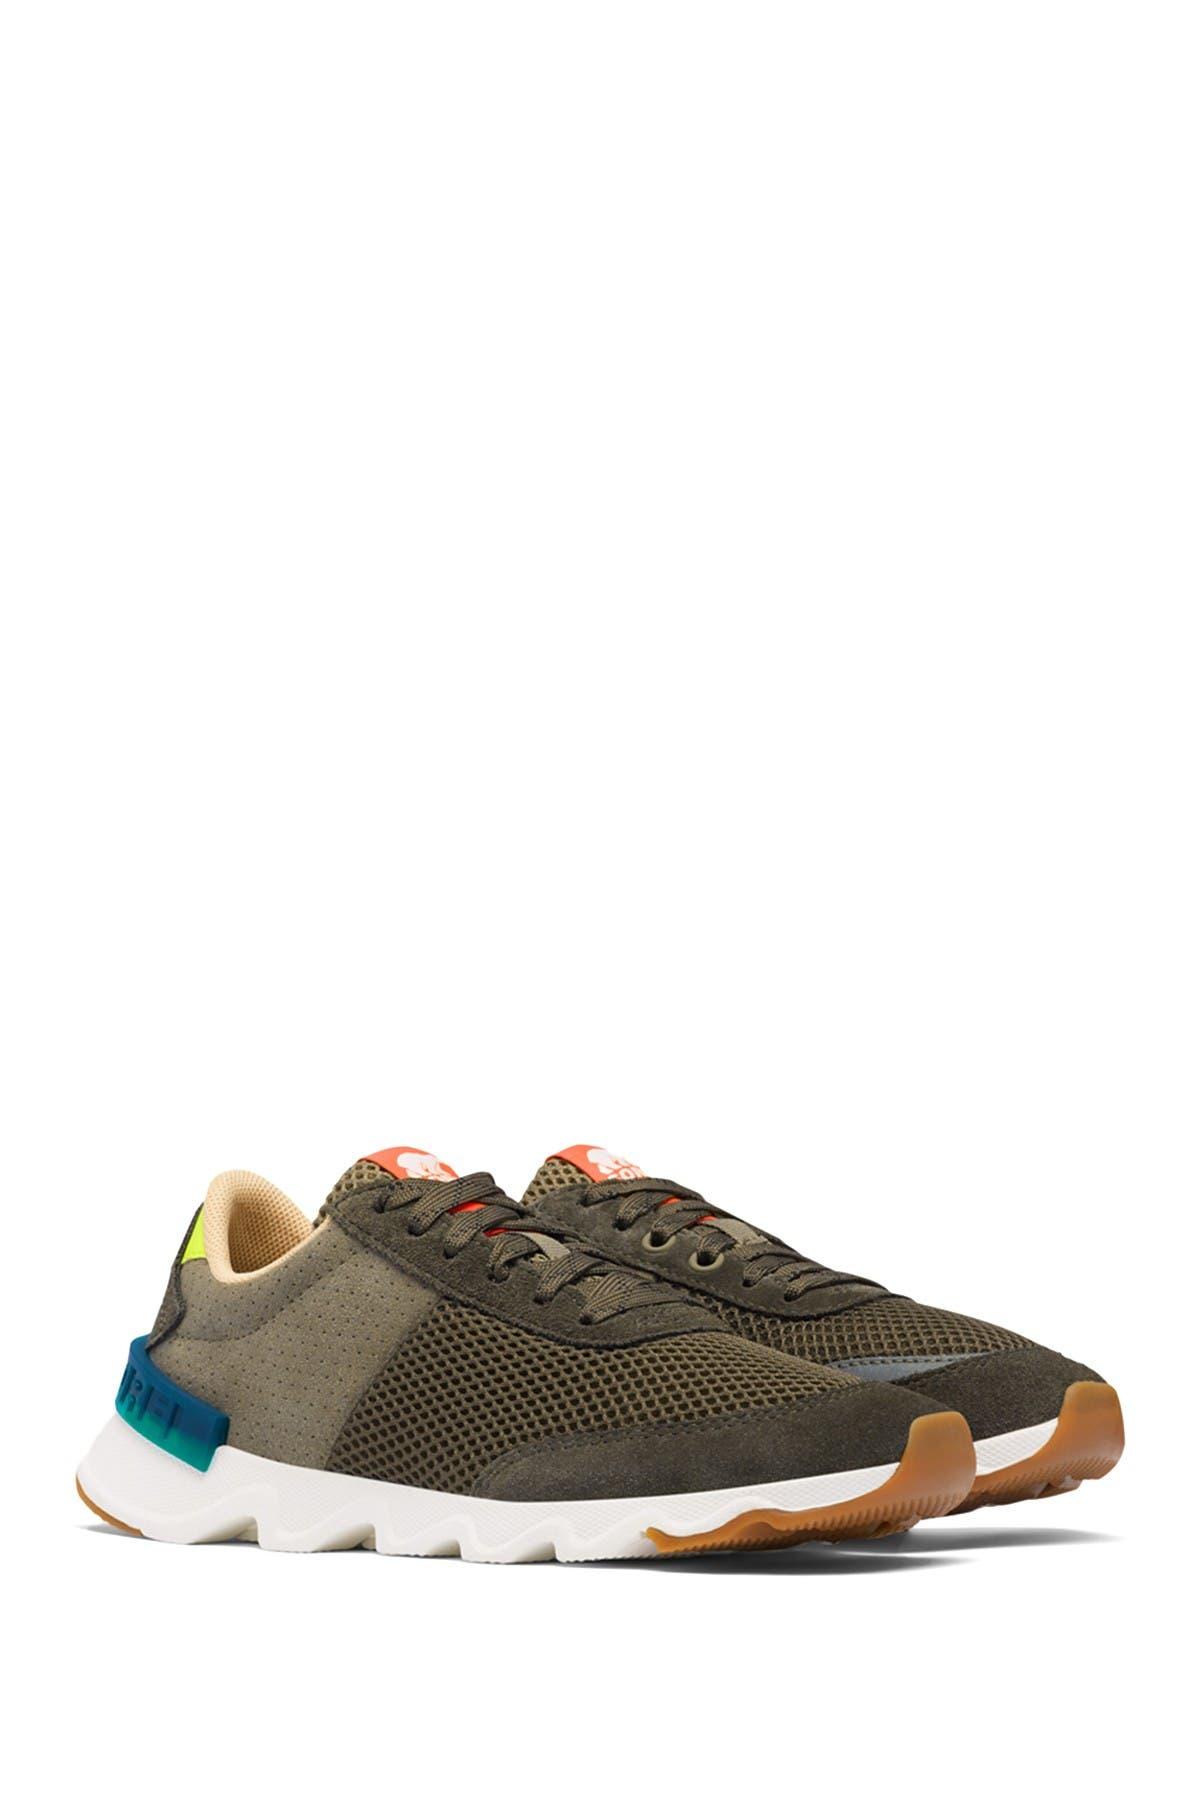 Image of Sorel Kinetic Lite Mesh Lace-Up Sneaker